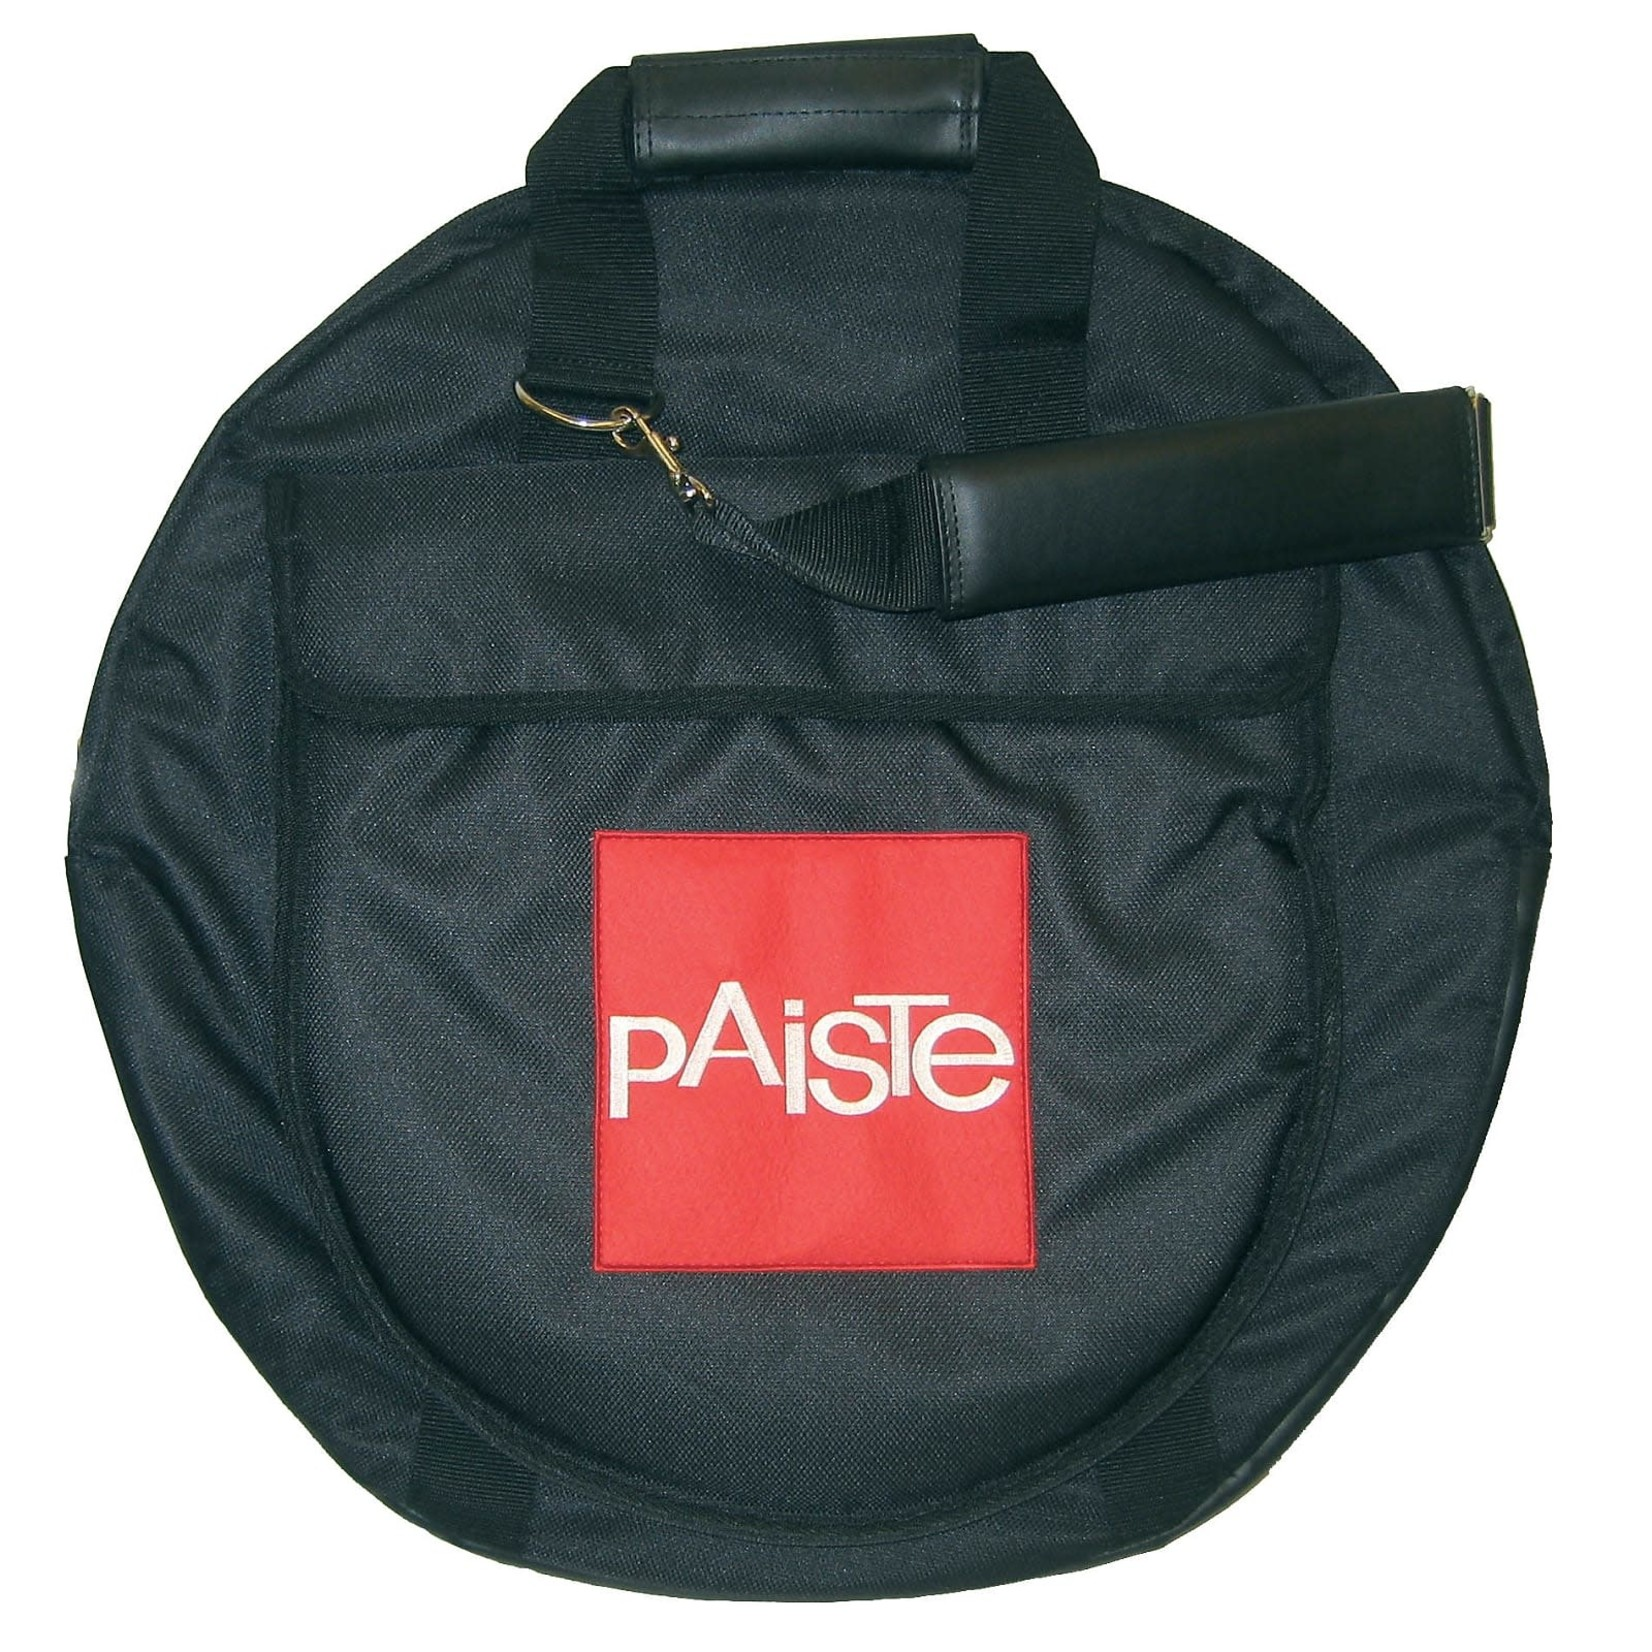 "Paiste PAISTE PROFESSIONAL CYMBAL BAG 24"" AC18524"